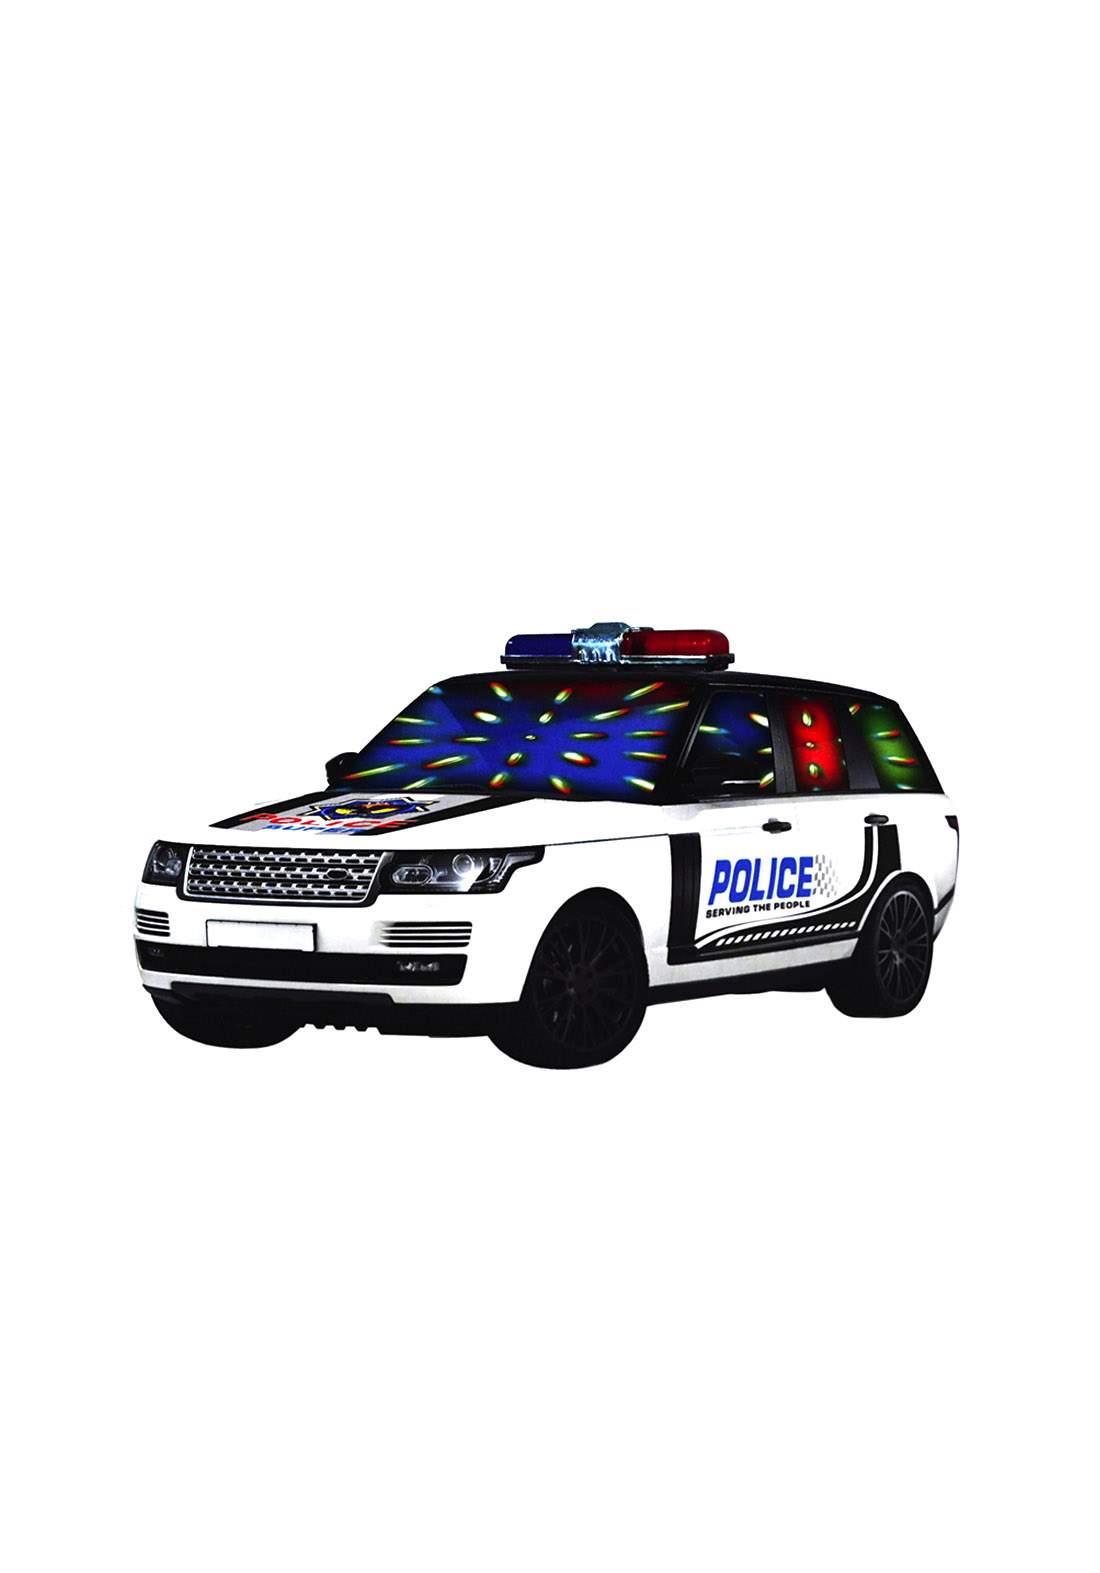 Yong Sheng Toys Police  Jeep Kids Toy لعبة سيارة الشرطة للأطفال